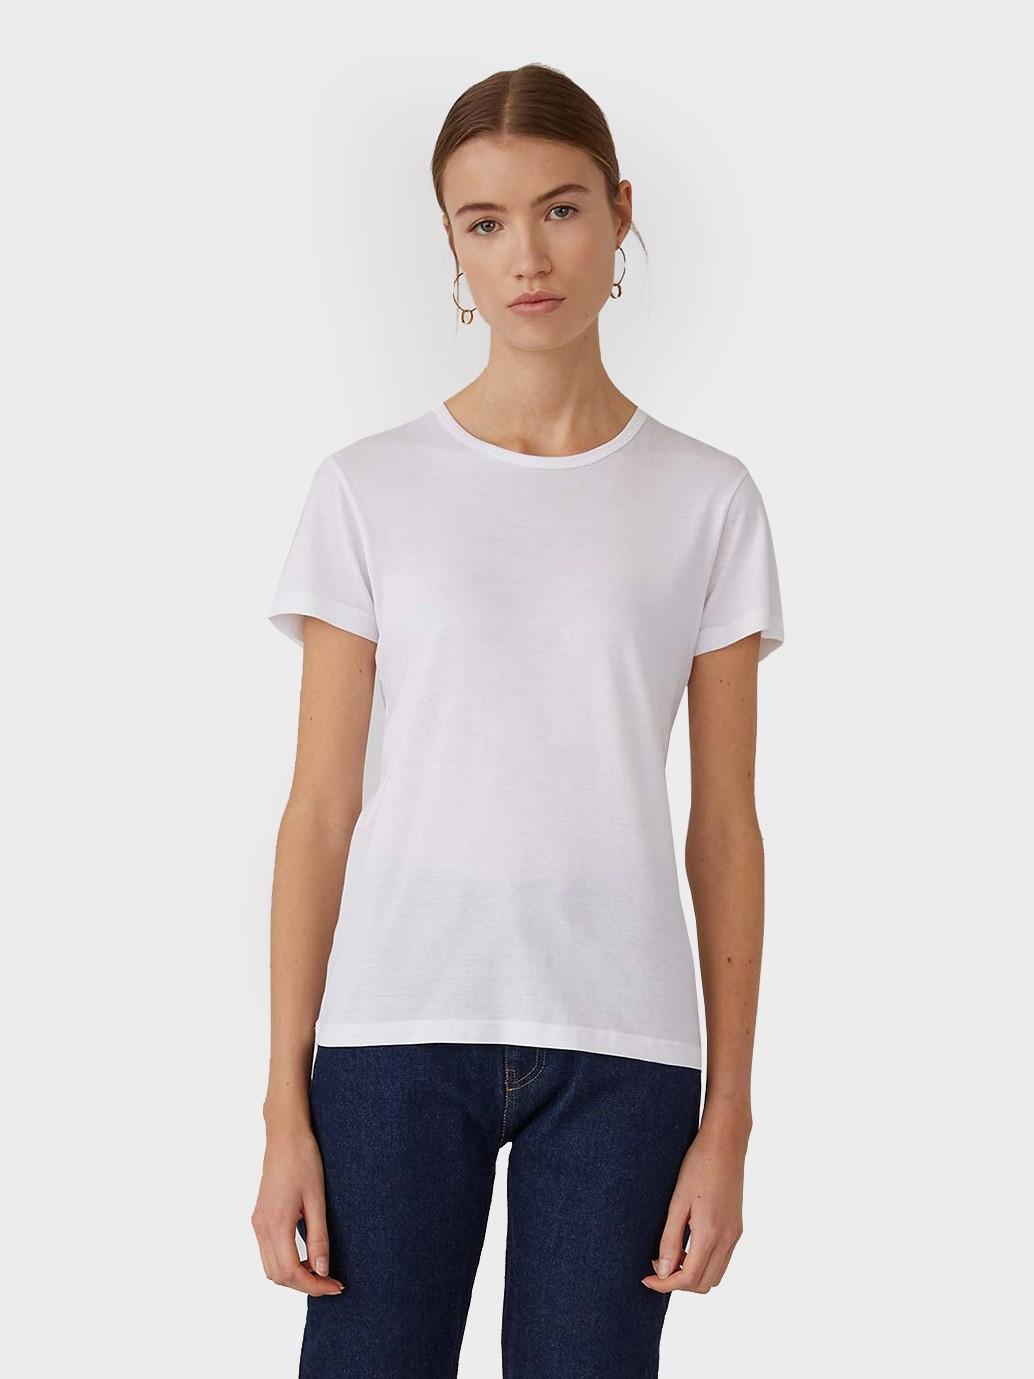 Sunspel Short Sleeve Classic Cotton T-Shirt in White